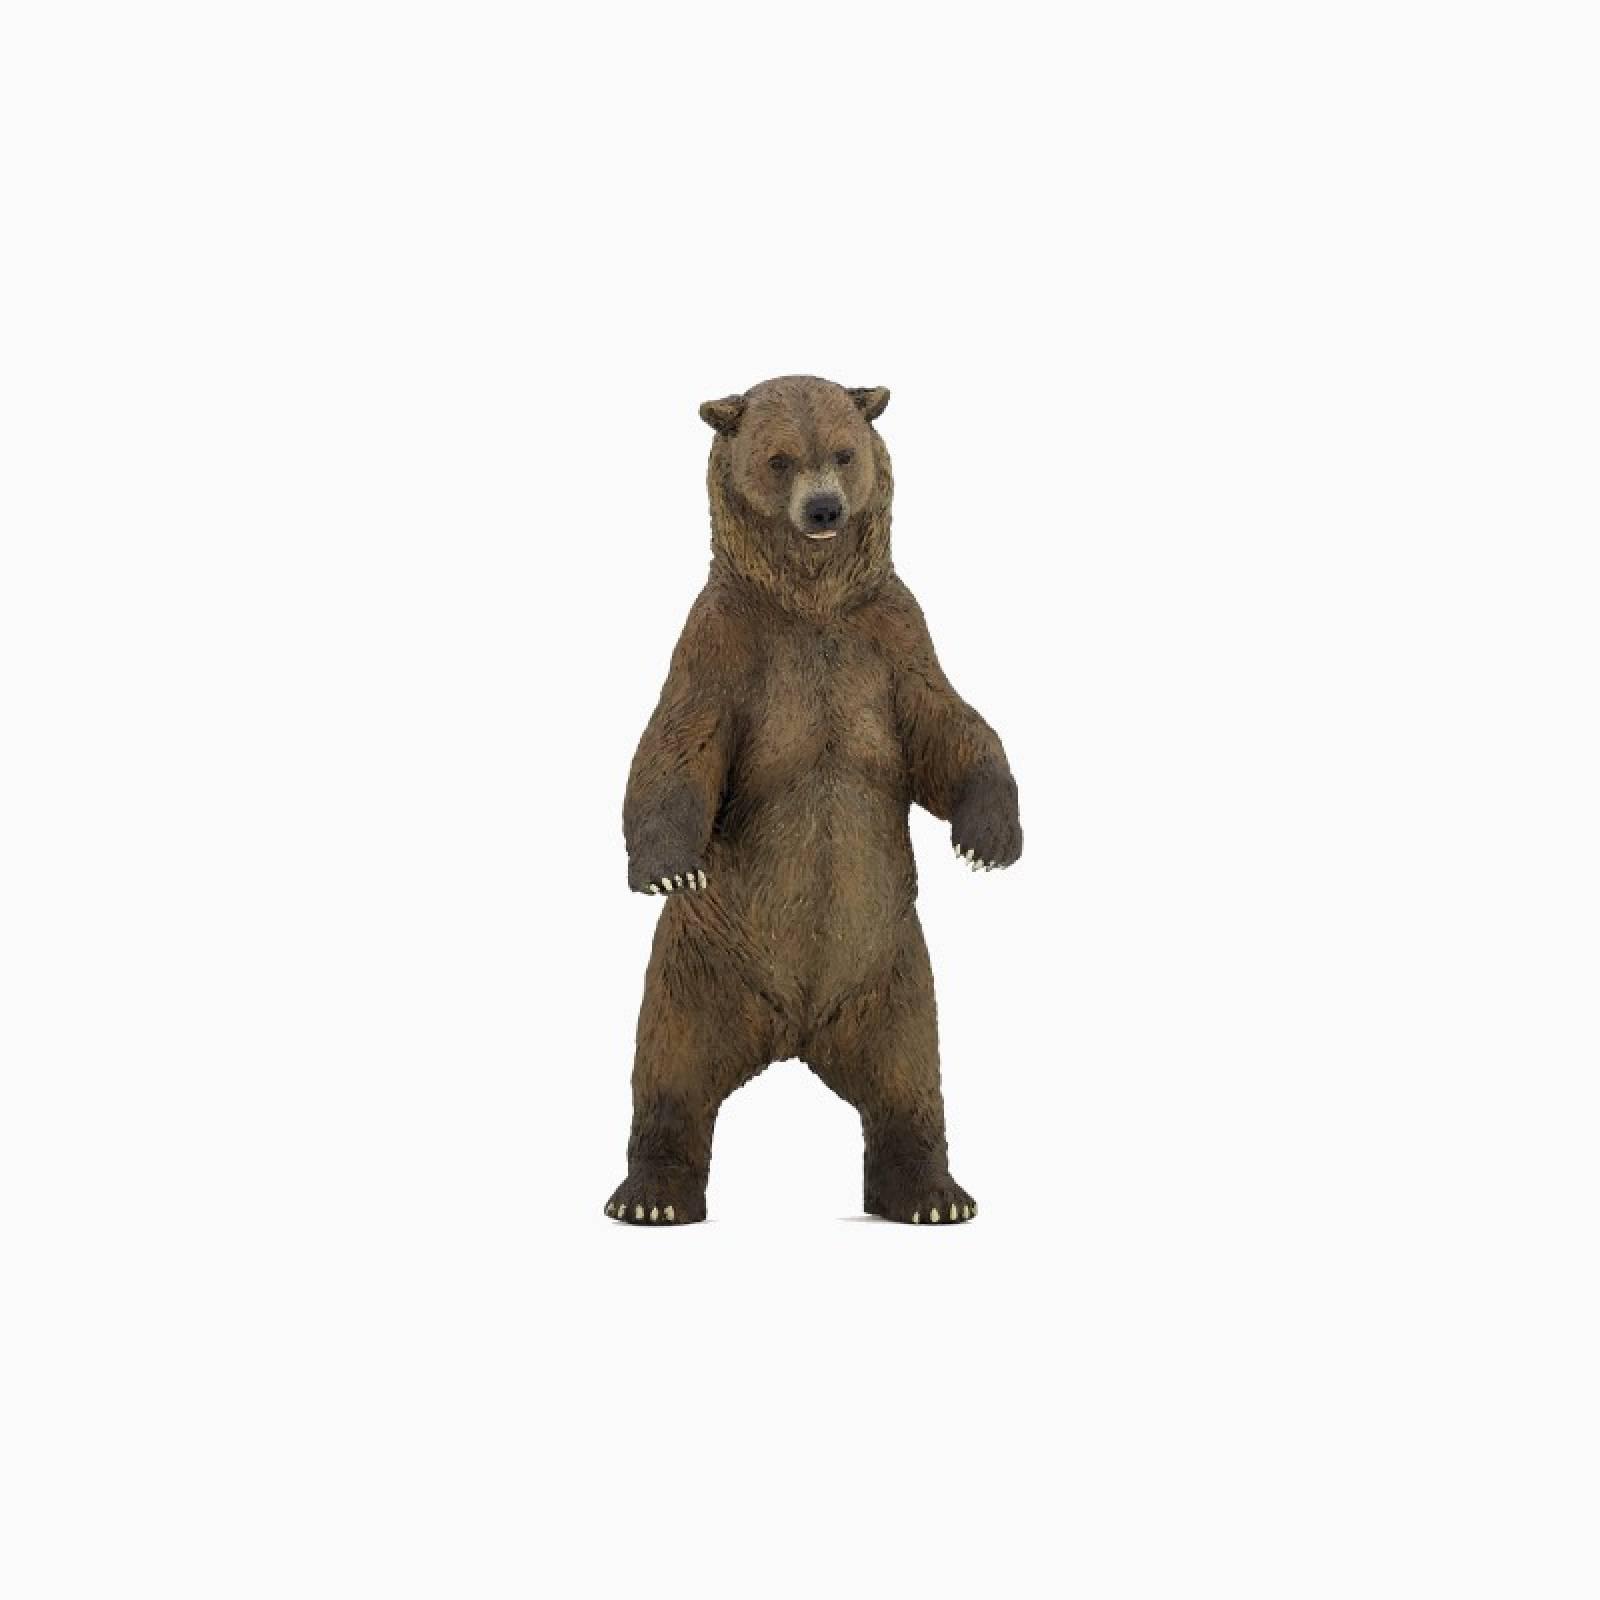 Grizzly Bear - Papo Wild Animal Figure